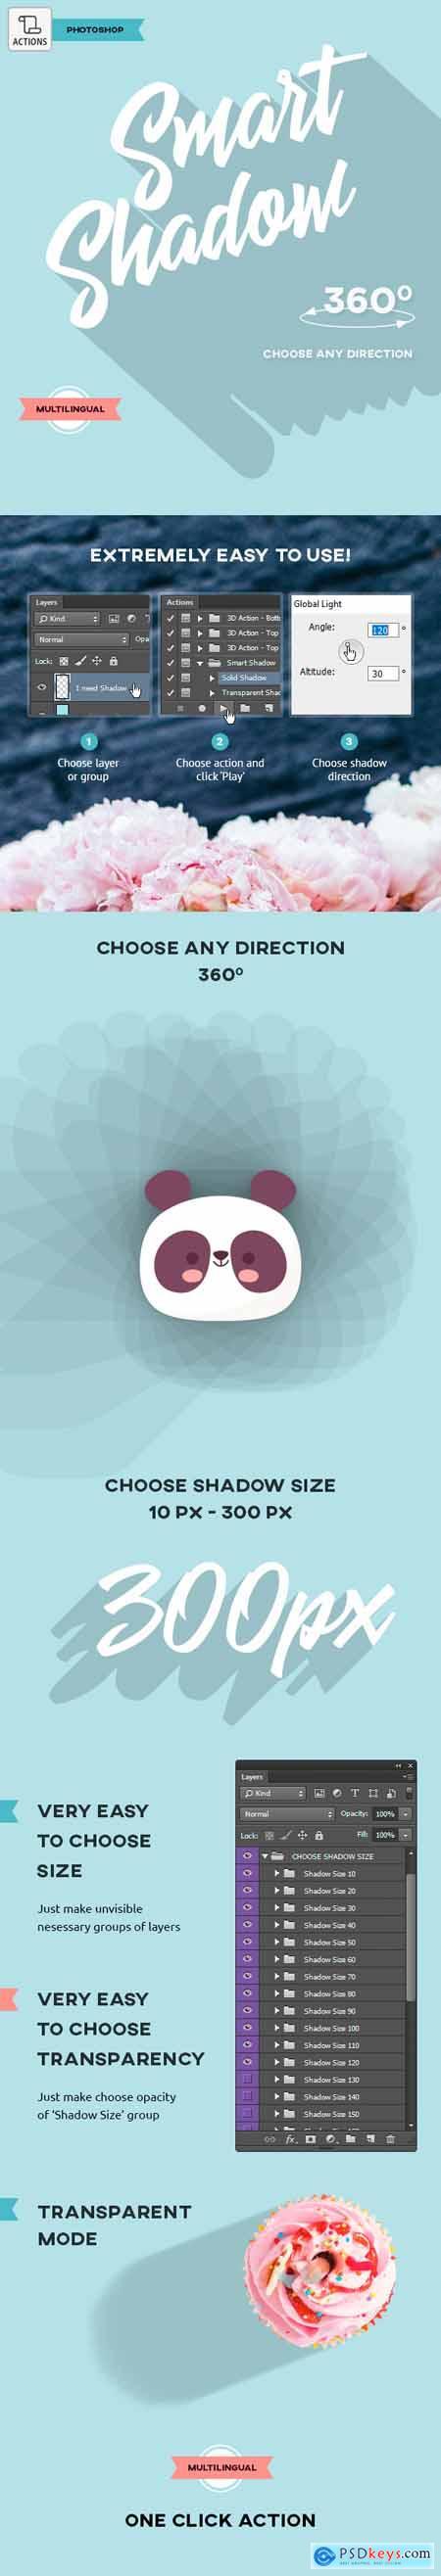 Smart Shadow - Photoshop Action